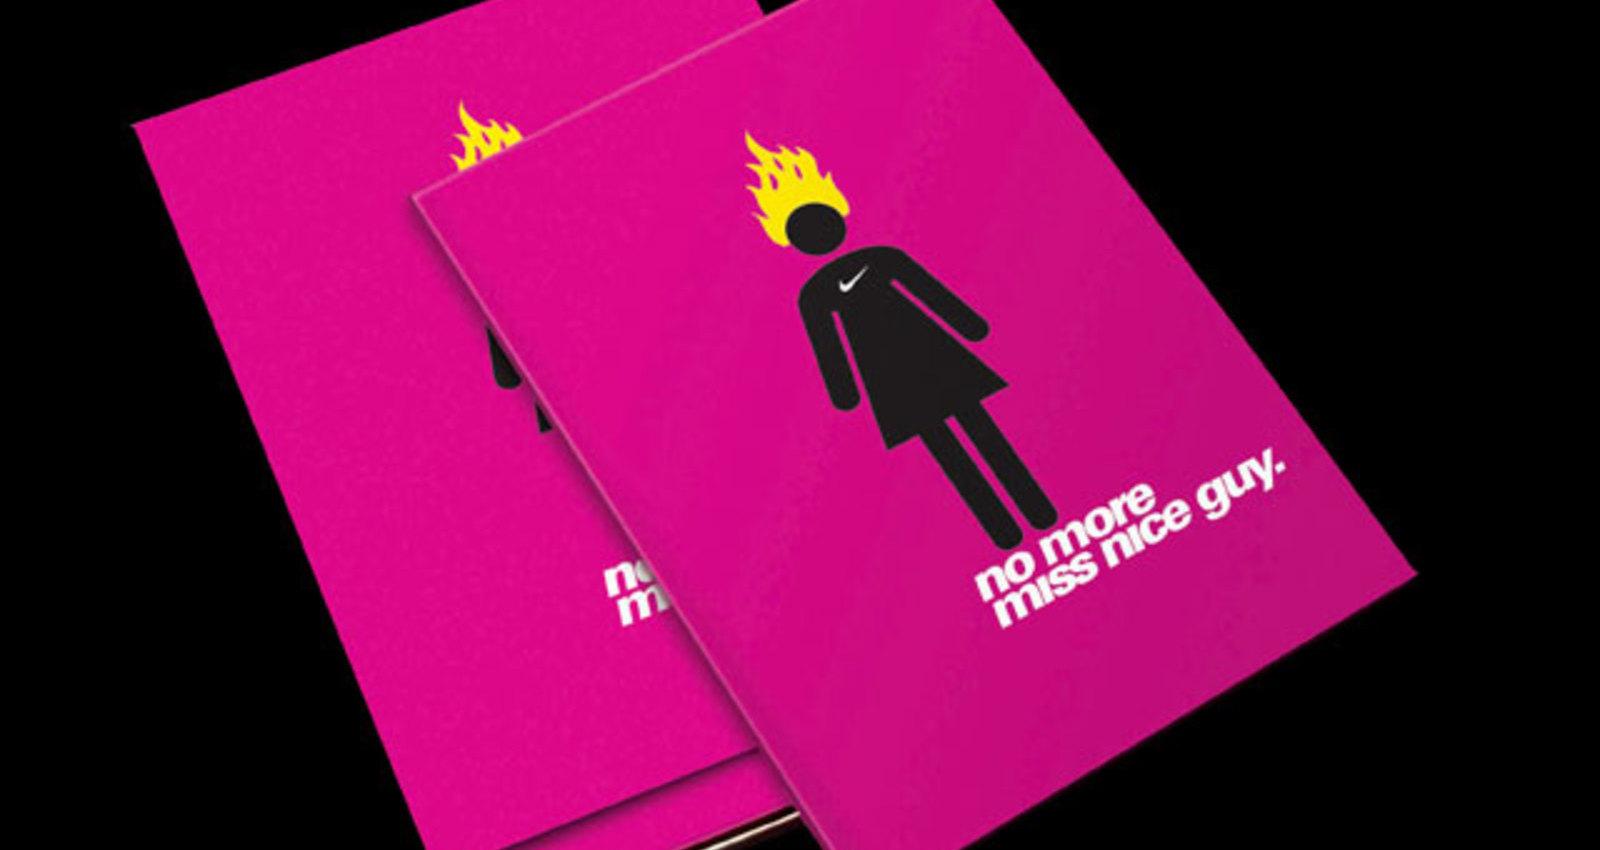 Nike Women's Apparel Book - No More Miss Nice Guy